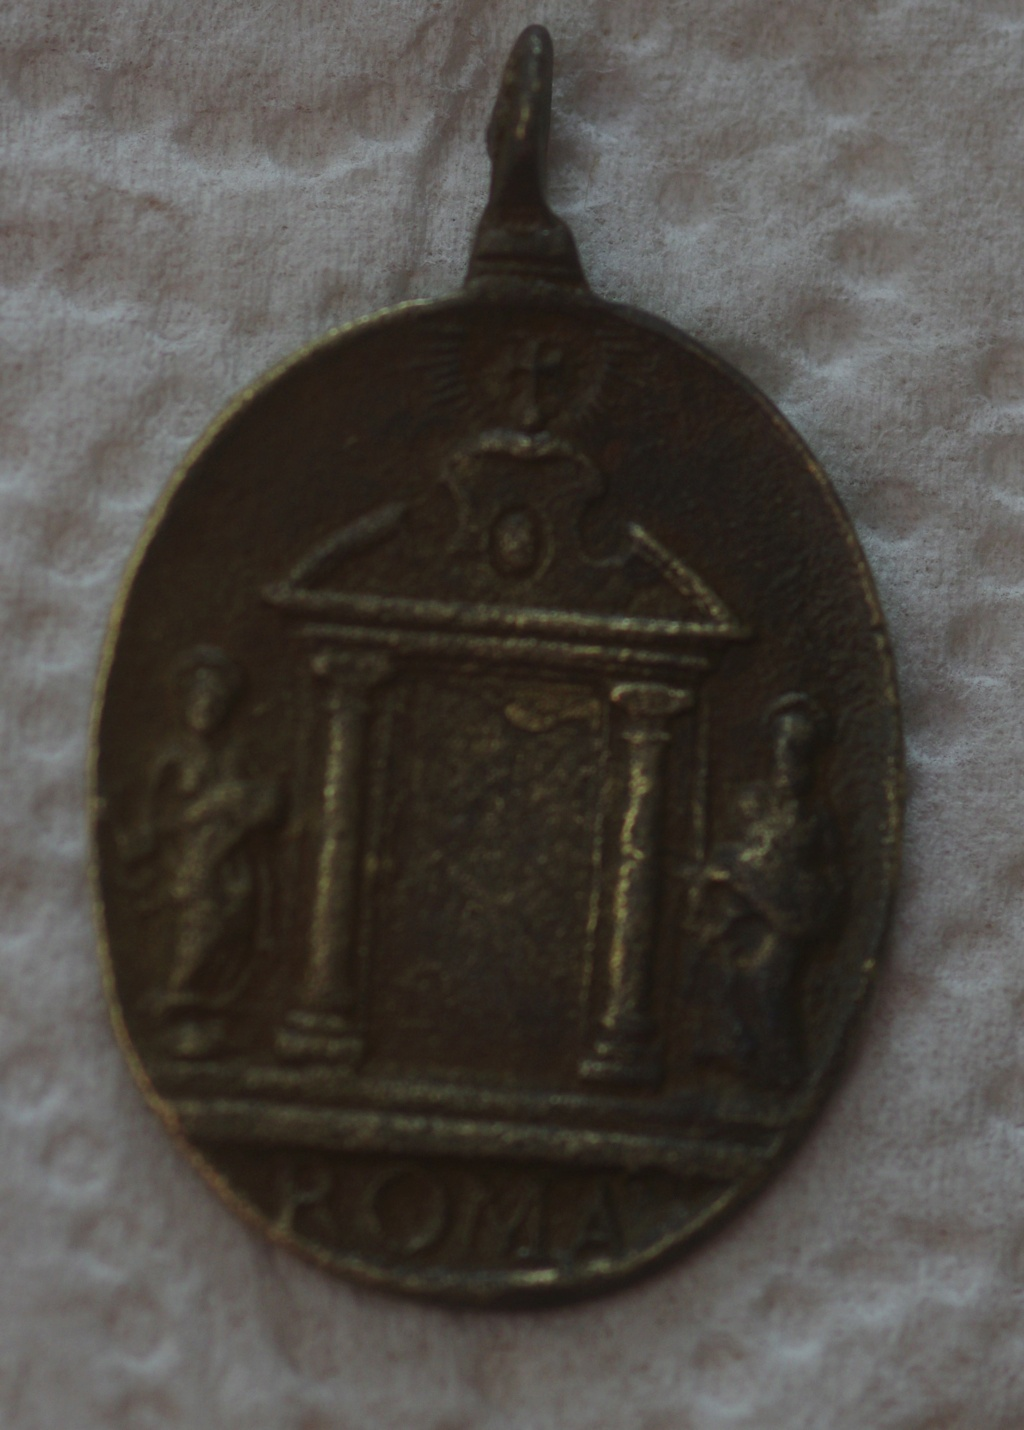 medallas religiosa du xvii eme siecle Phot0314